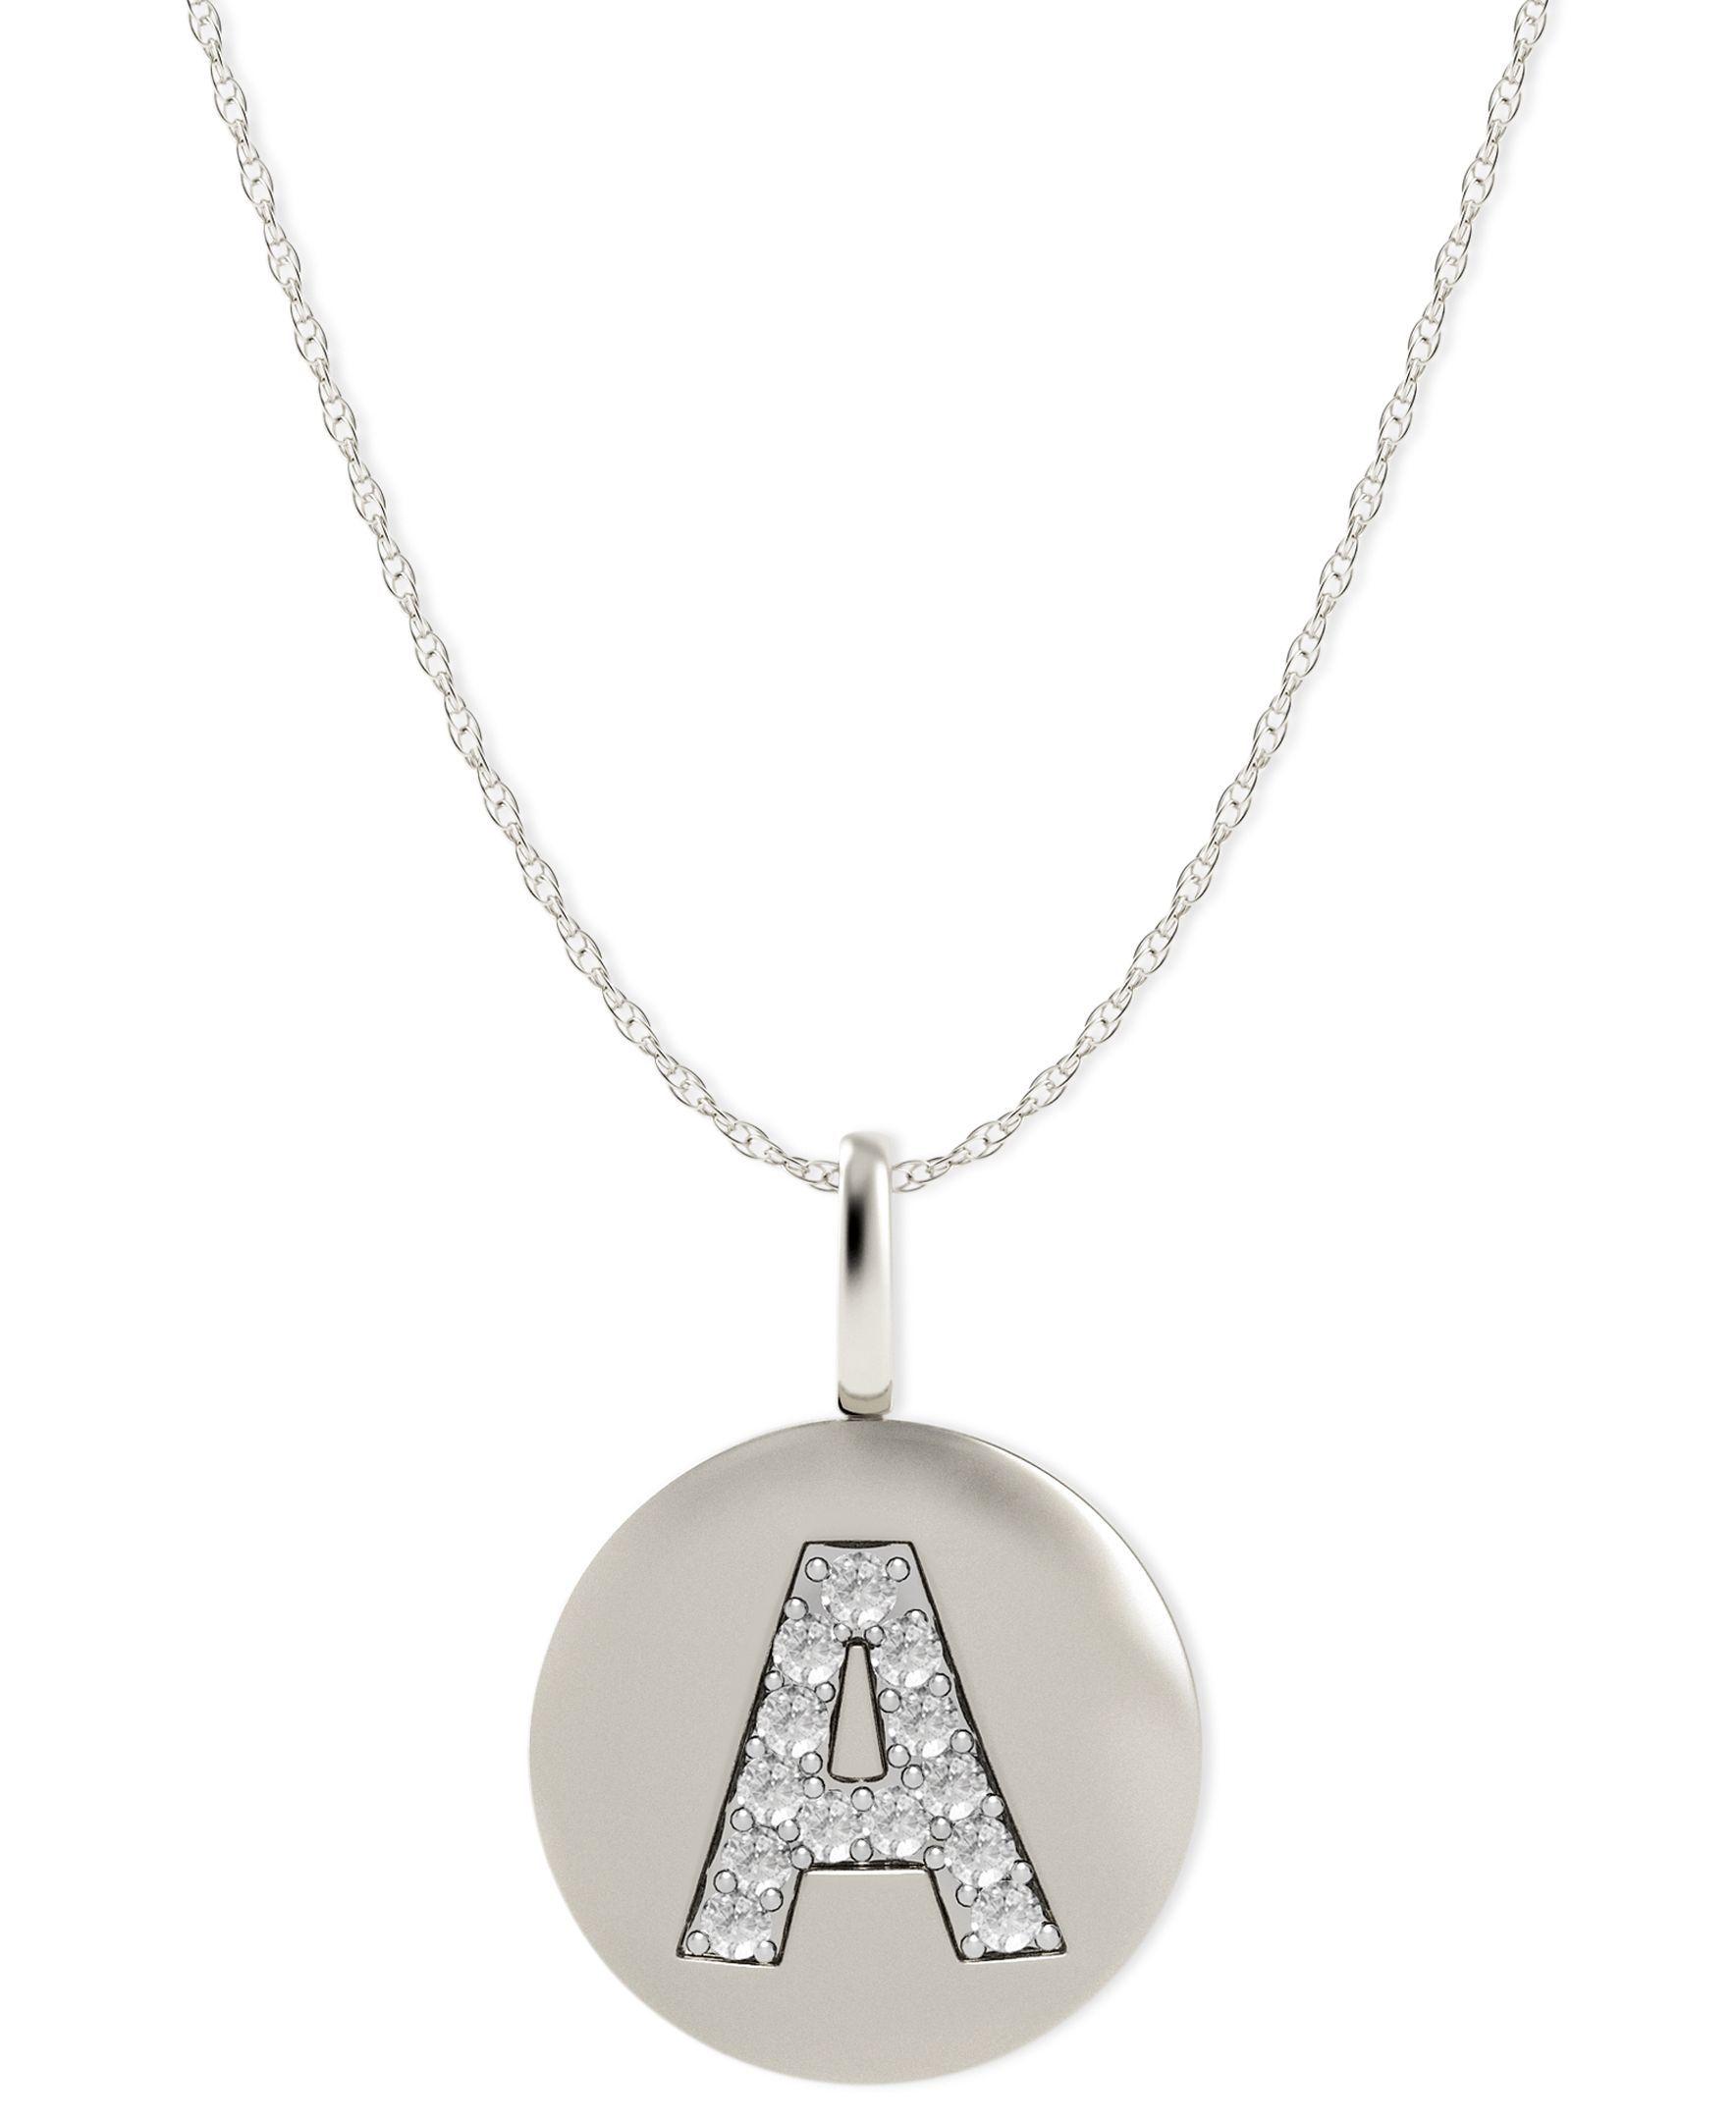 K white gold necklace diamond accent letter a disk pendant